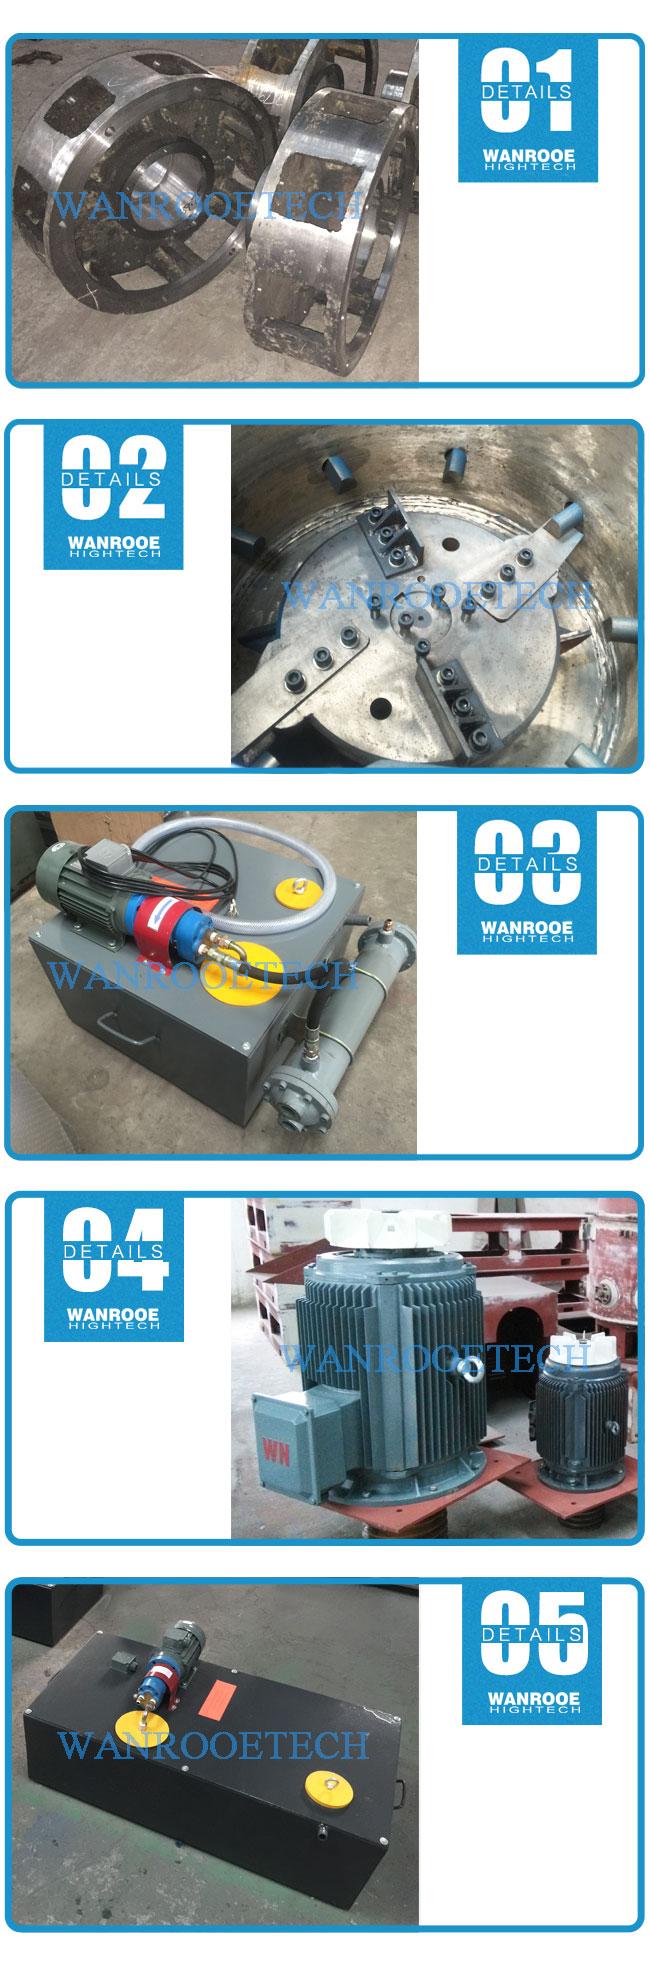 Industrial Film Agglomerator, Film Agglomerator, Film Densifier, Agricultural Film Agglomerator, Packaging Agglomerator